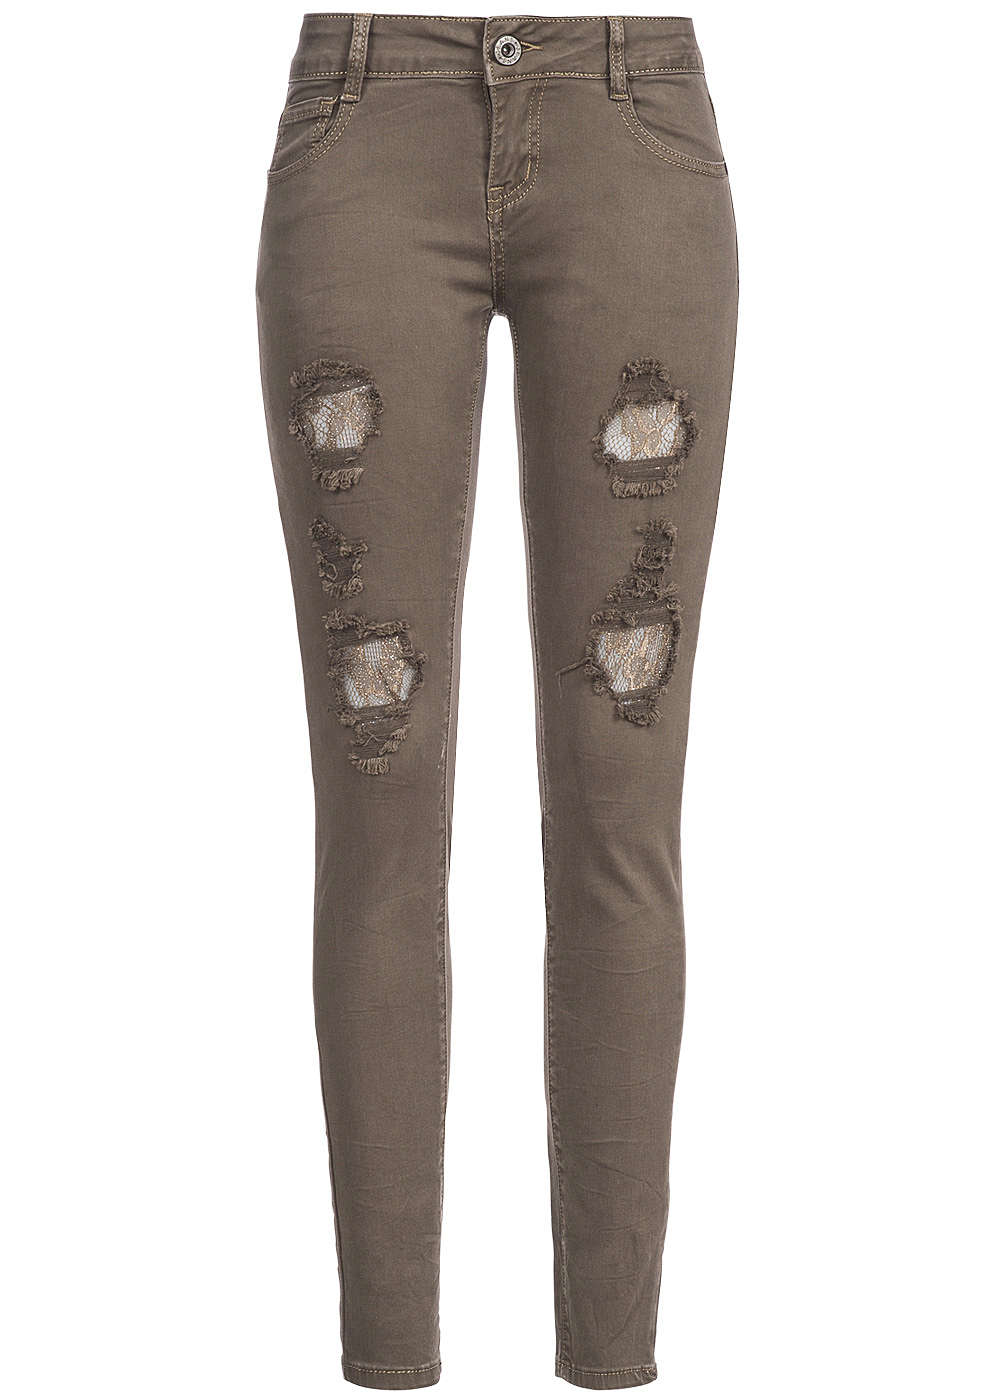 hailys damen jeans 5 pocket style destroy look spitze mit glitzer khaki 77onlineshop. Black Bedroom Furniture Sets. Home Design Ideas